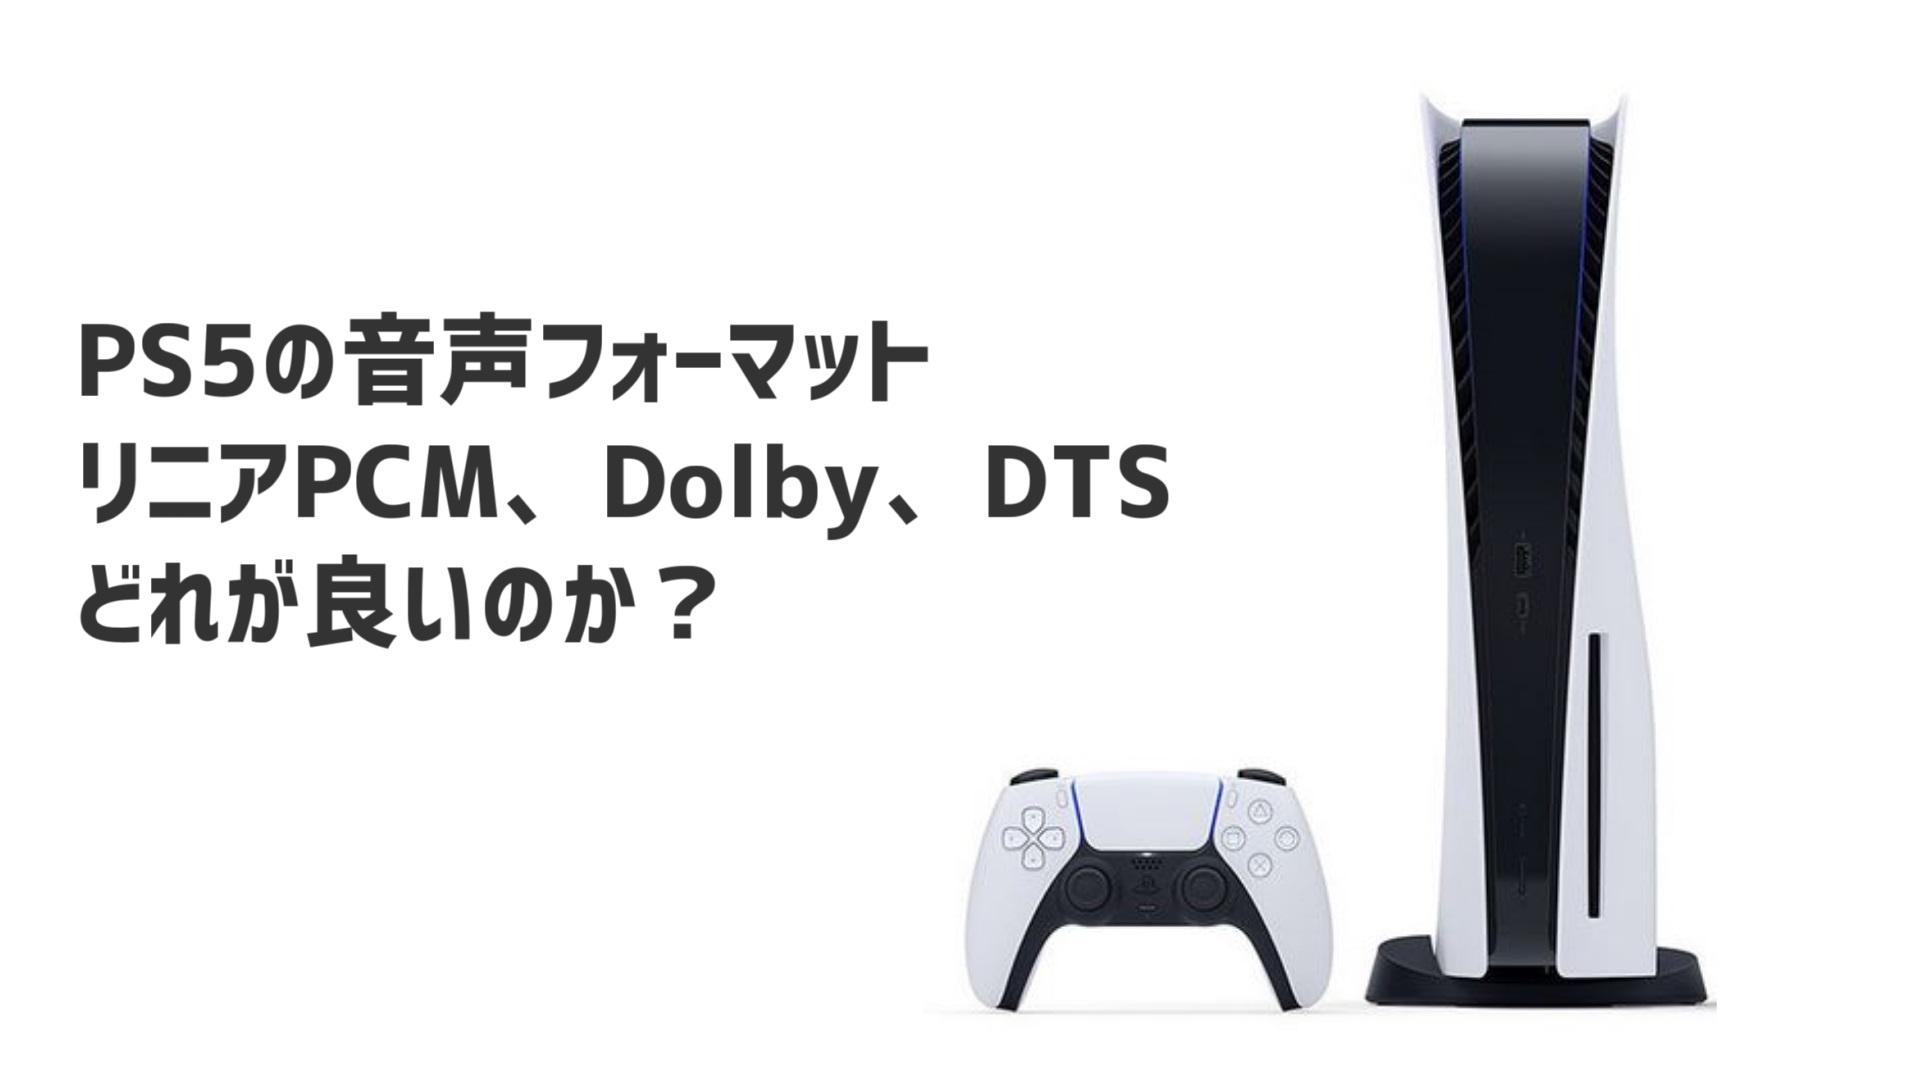 PS5の音声フォーマットはリニアPCM、Dolby、DTSのどれが良いか?